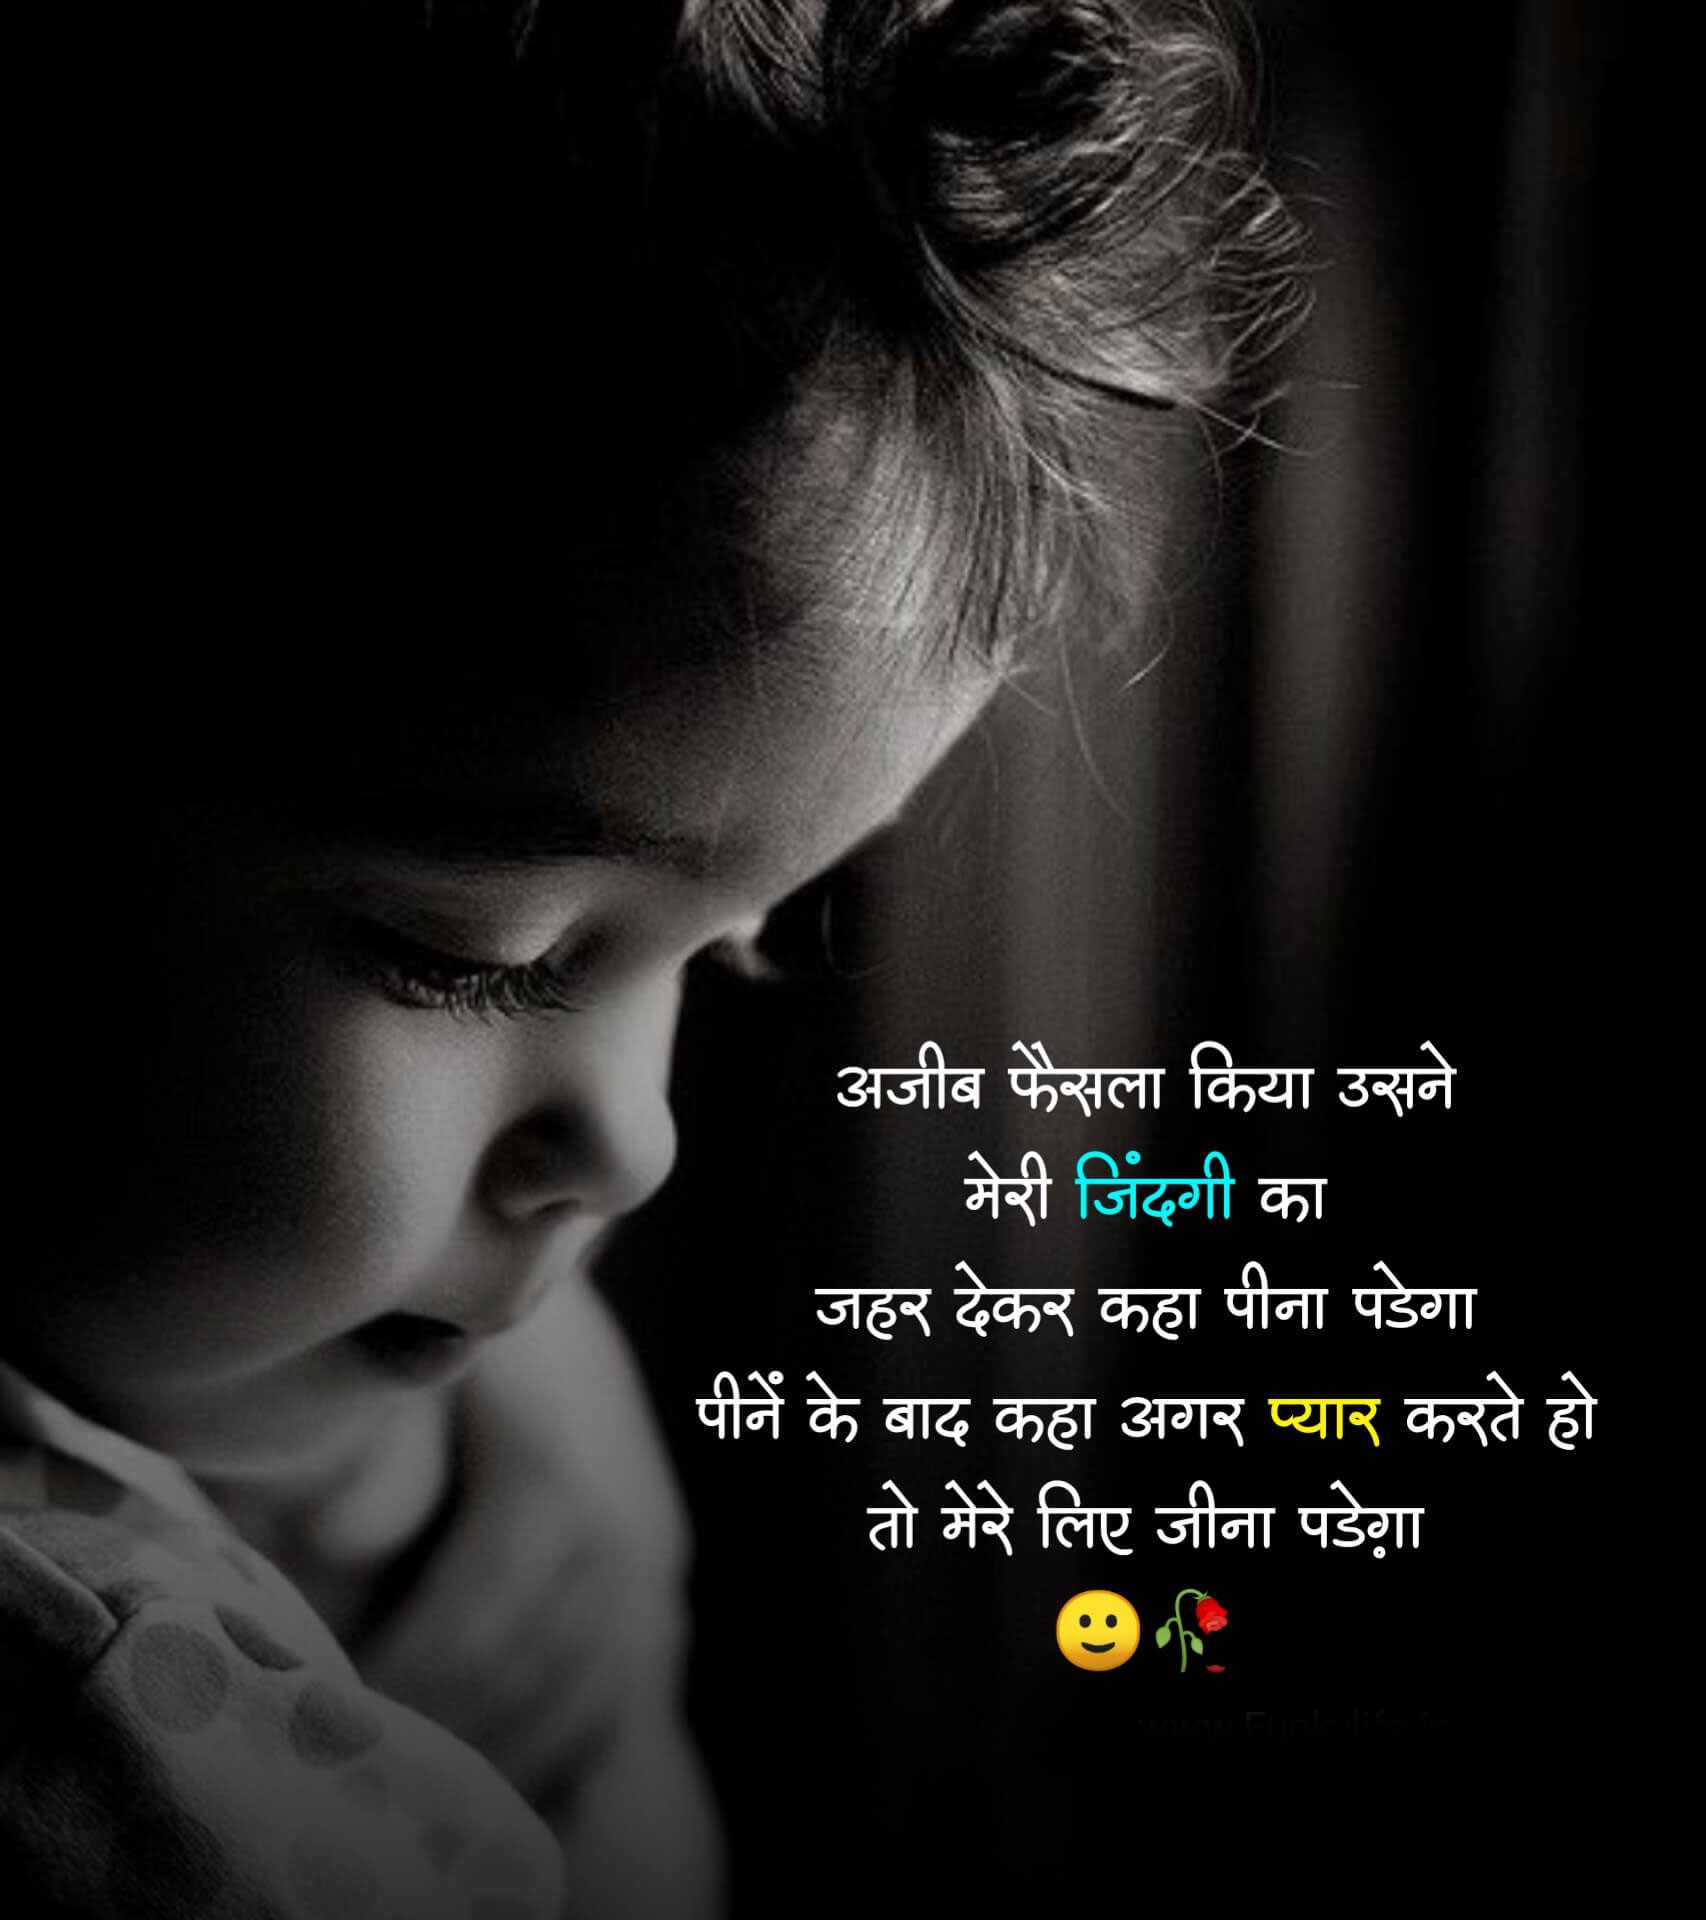 New Sad Boy Shayari Images pictures